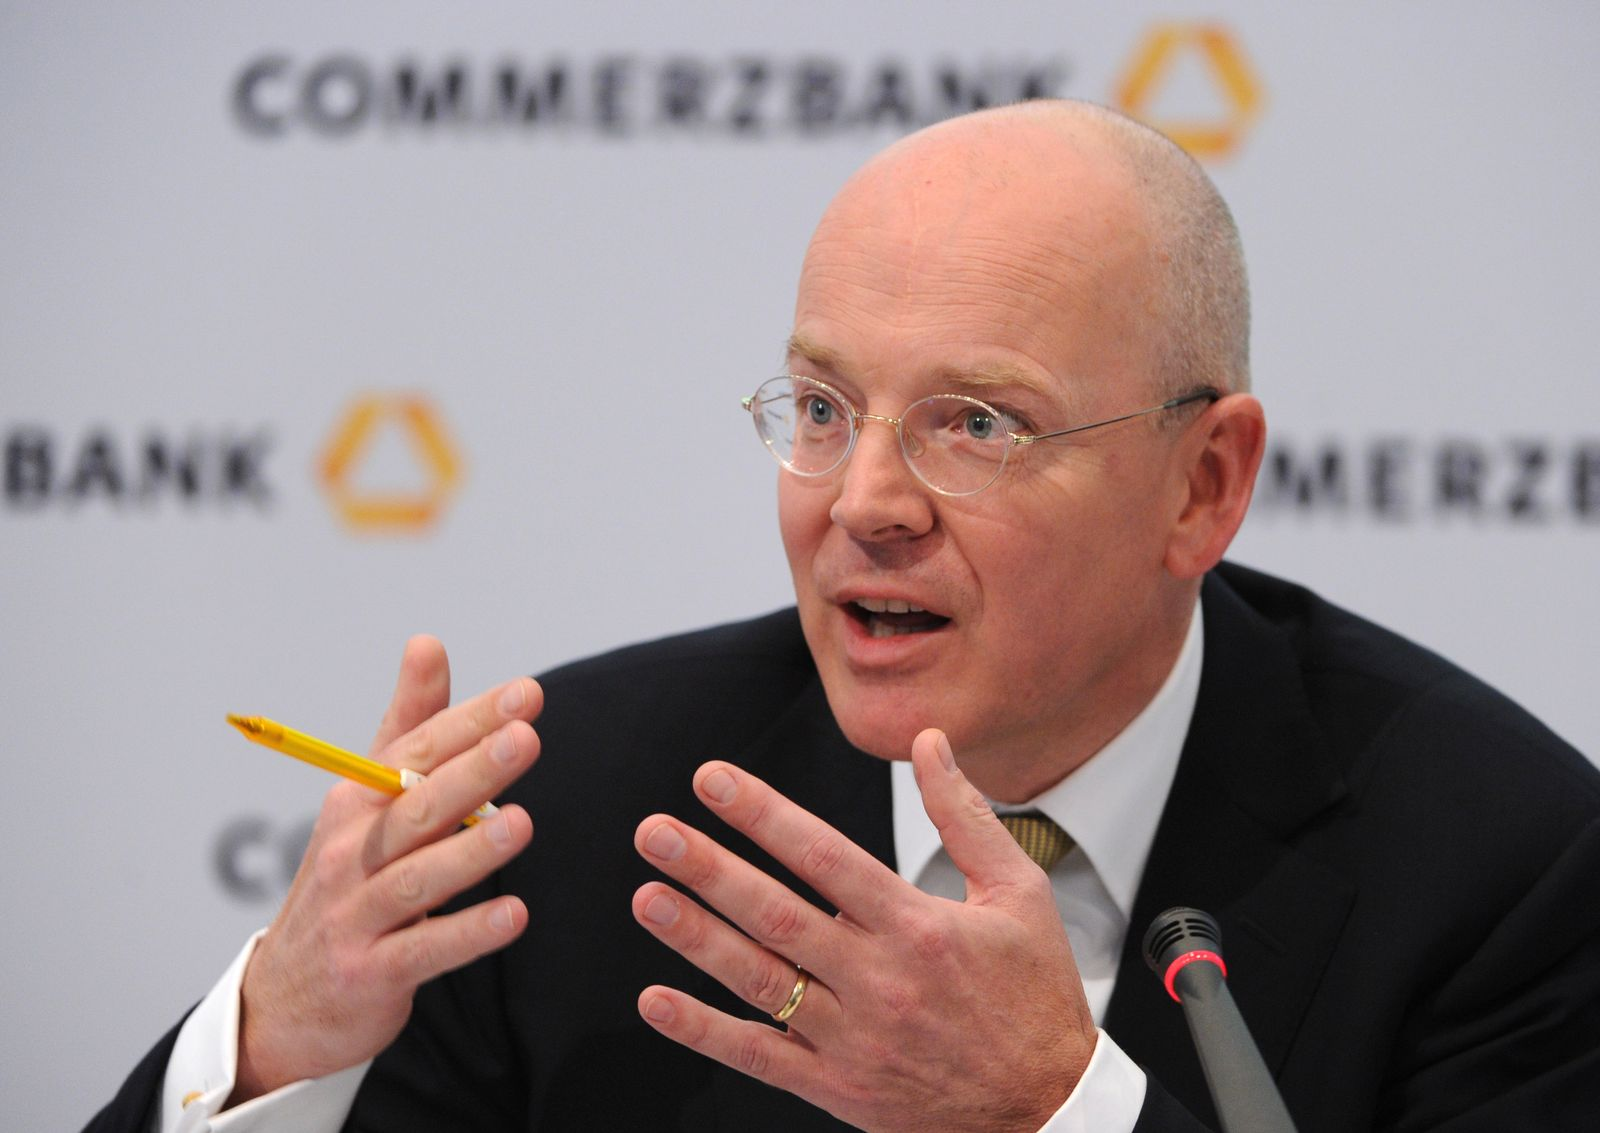 Bilanz-PK Commerzbank AG